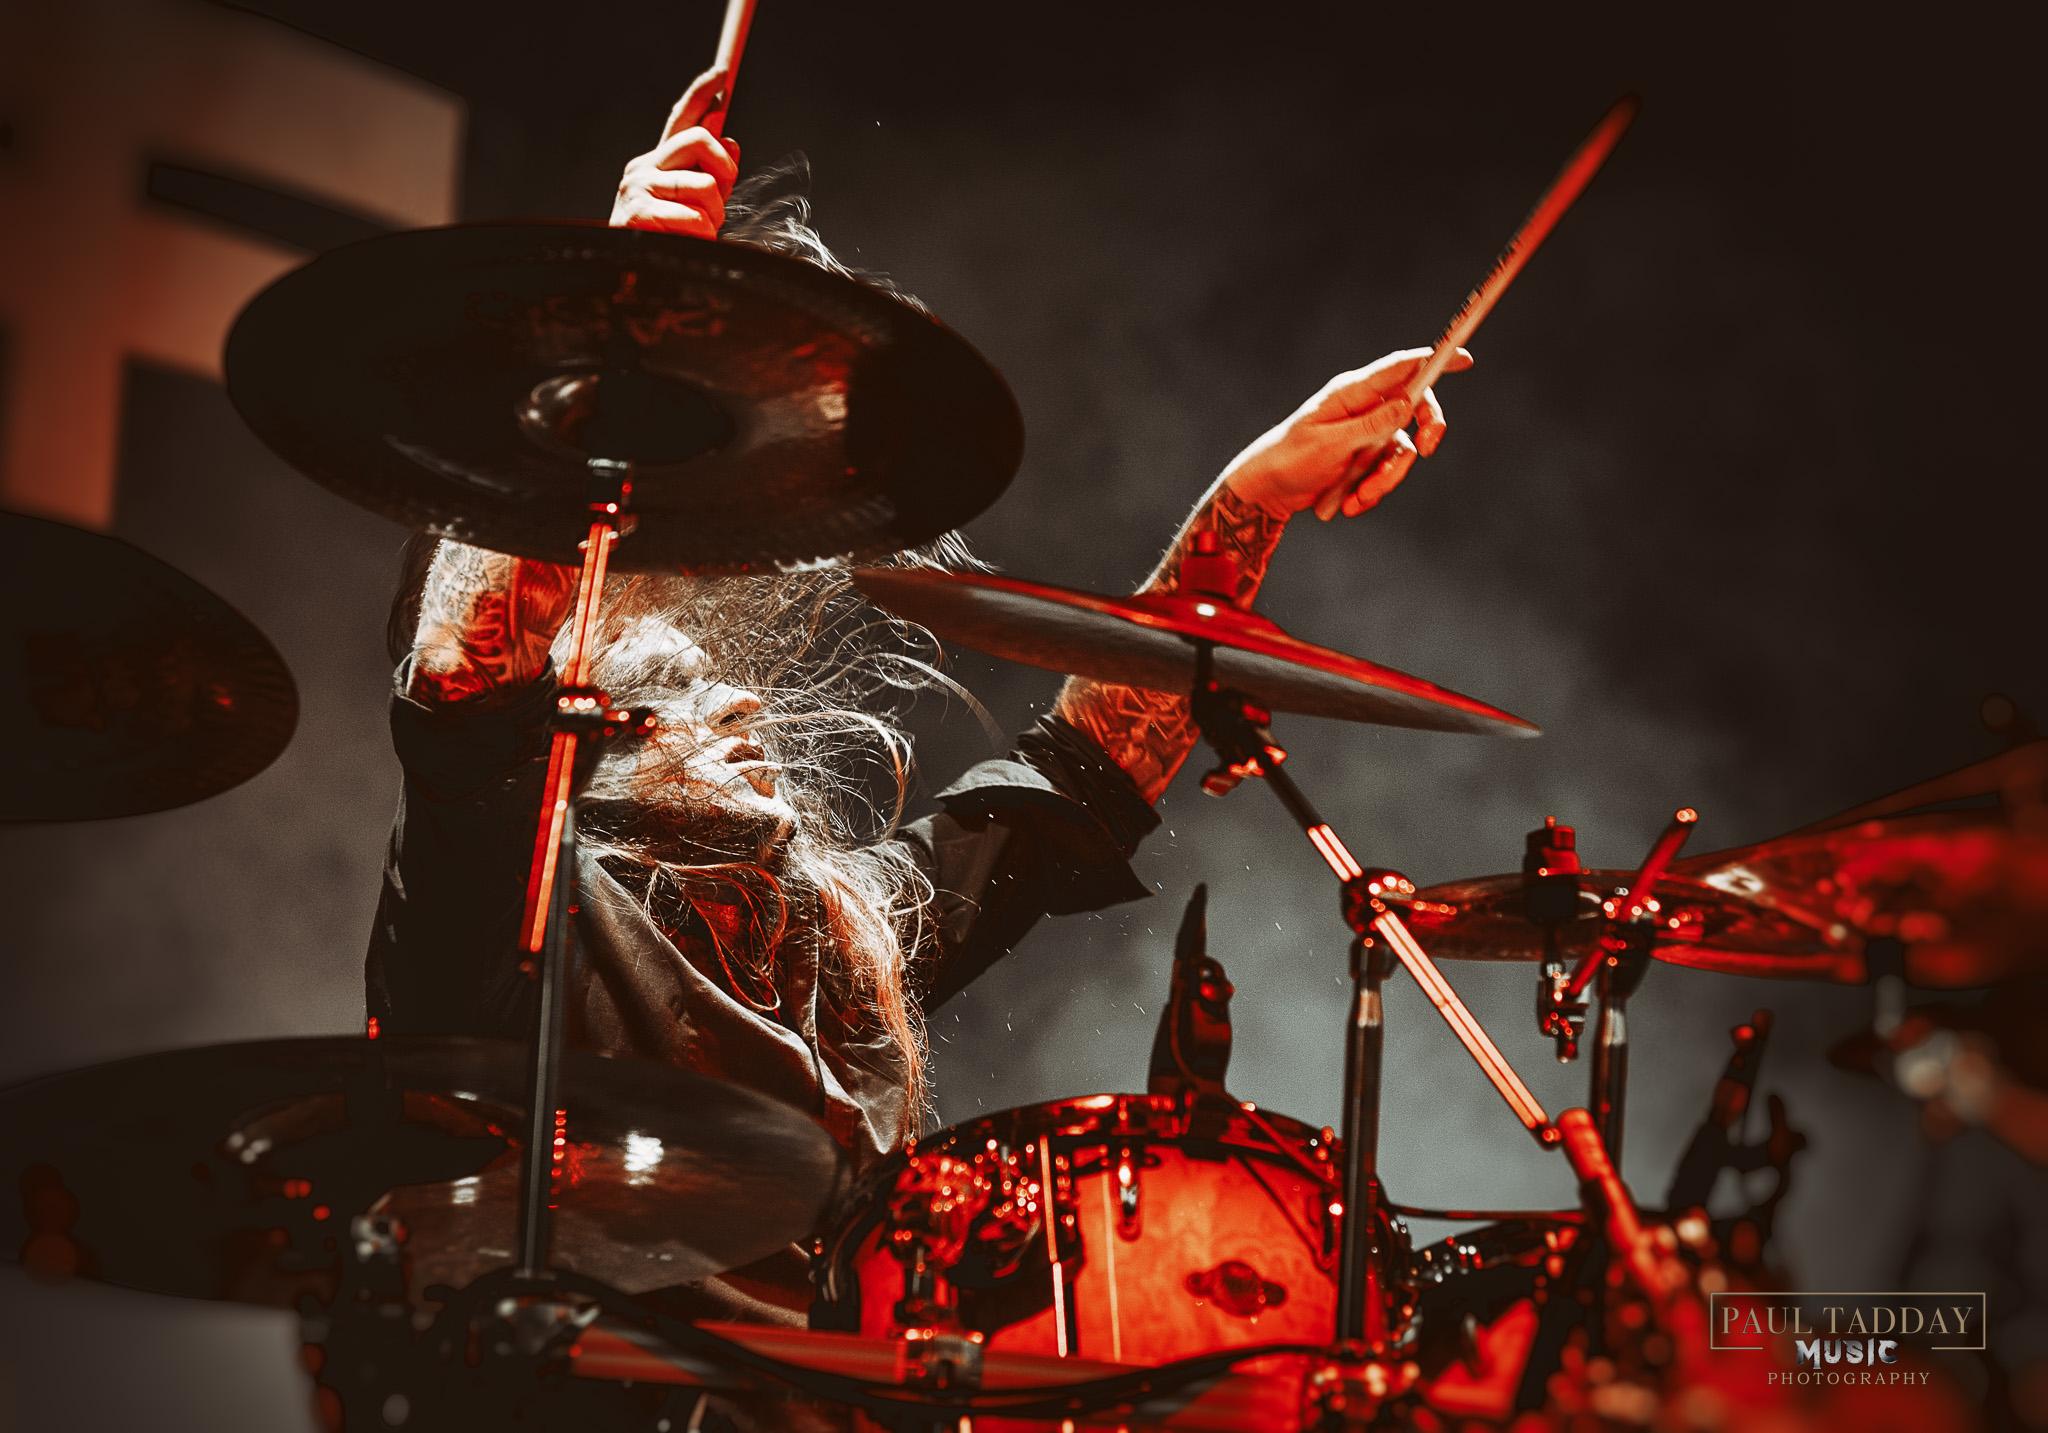 behemoth - brisbane - march 7 2019 - web - paul tadday photography - 10.jpg